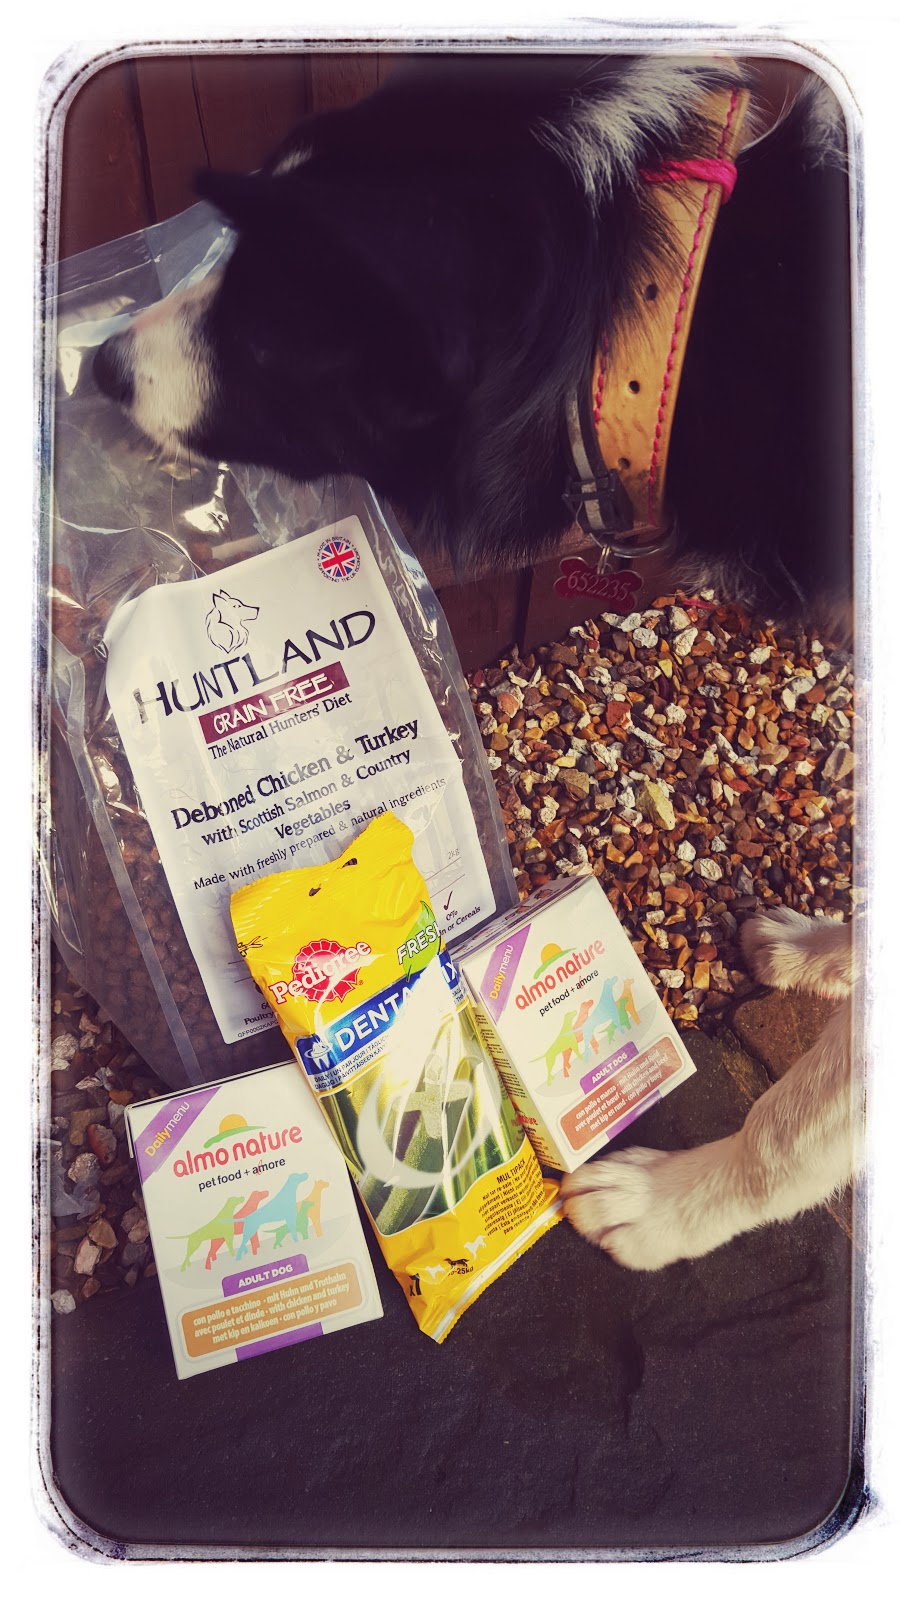 Pet Shop UK: Puppy Food Review For Mollie